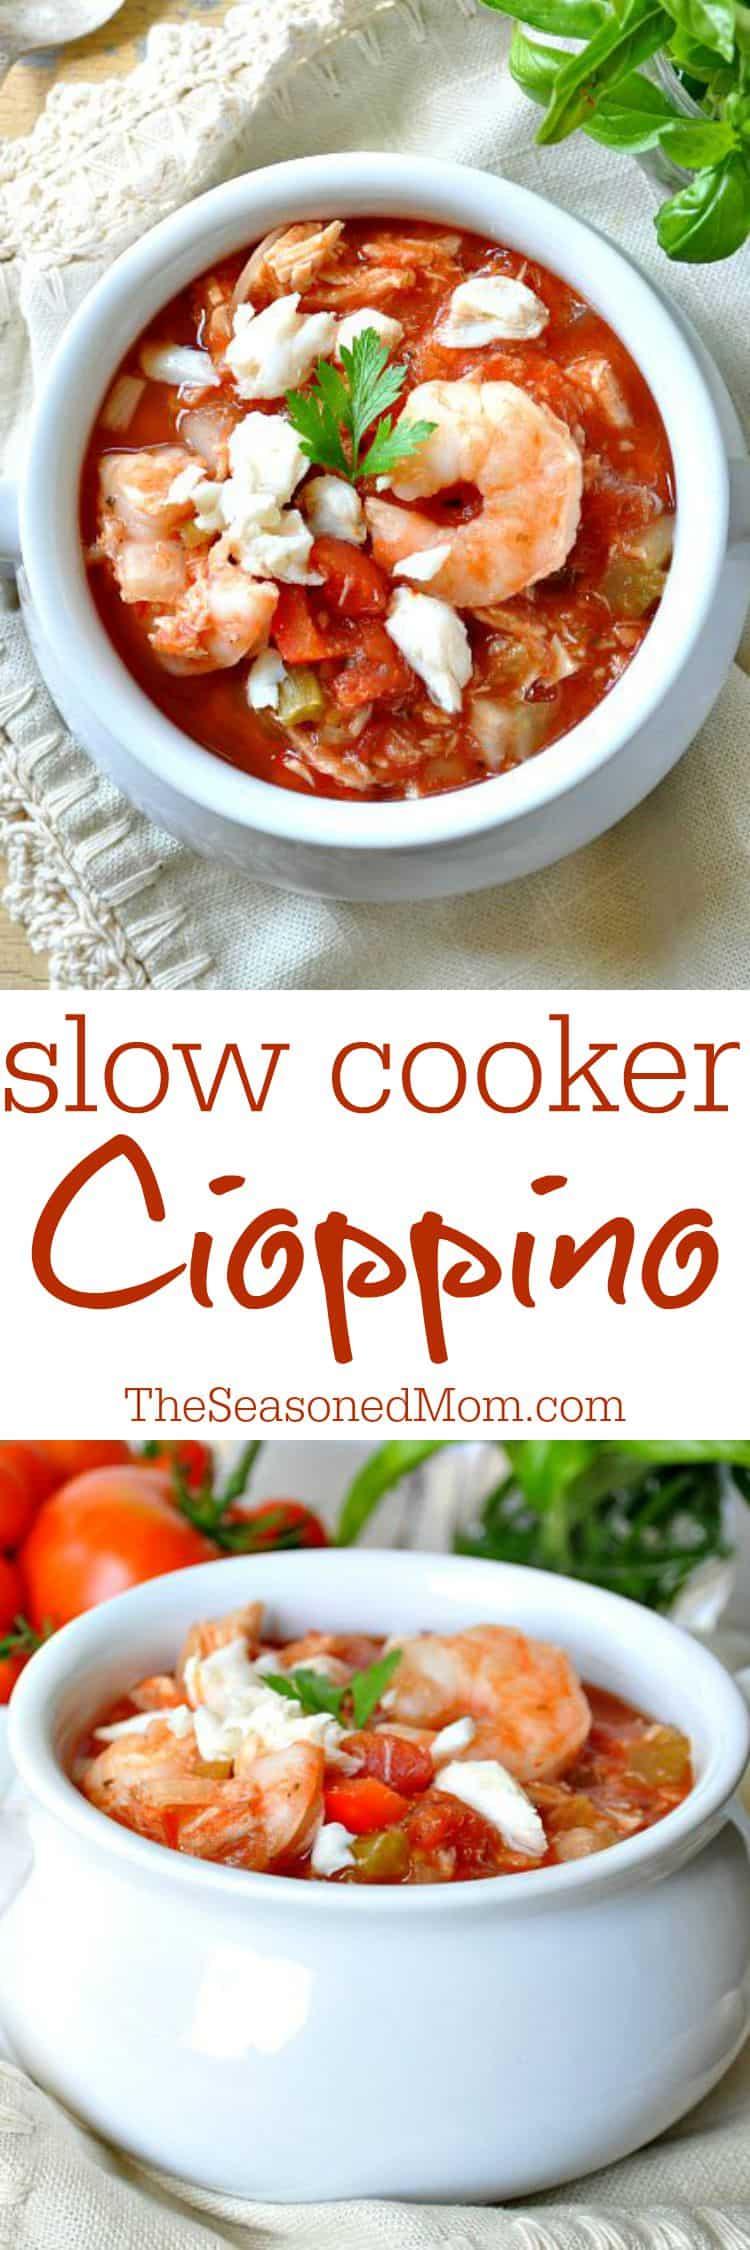 Slow Cooker Cioppino